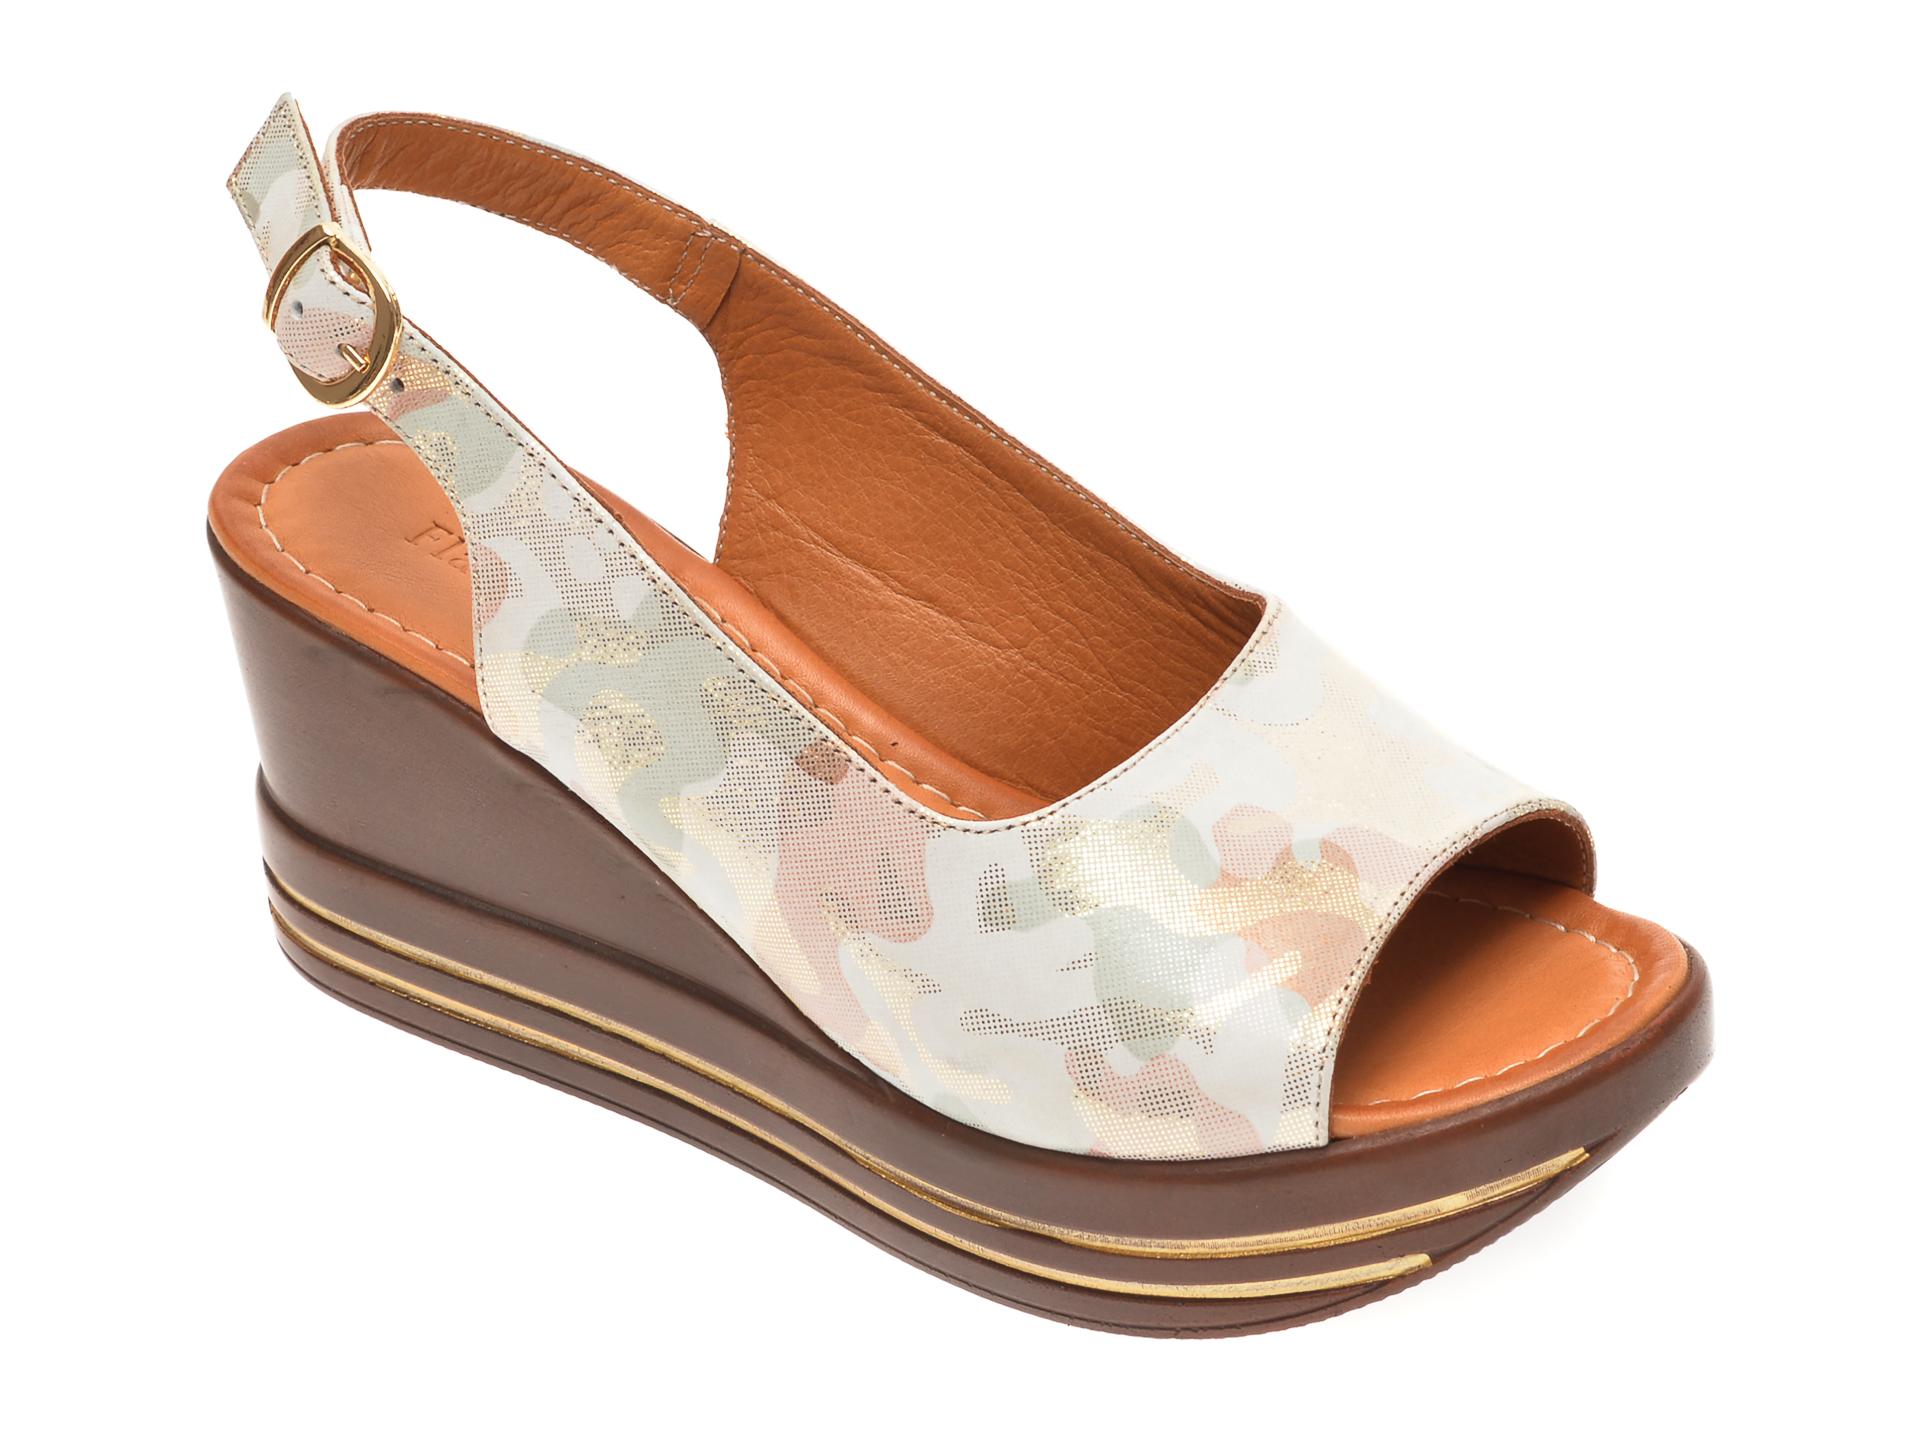 Sandale FLAVIA PASSINI multicolore, 1182724, din piele naturala